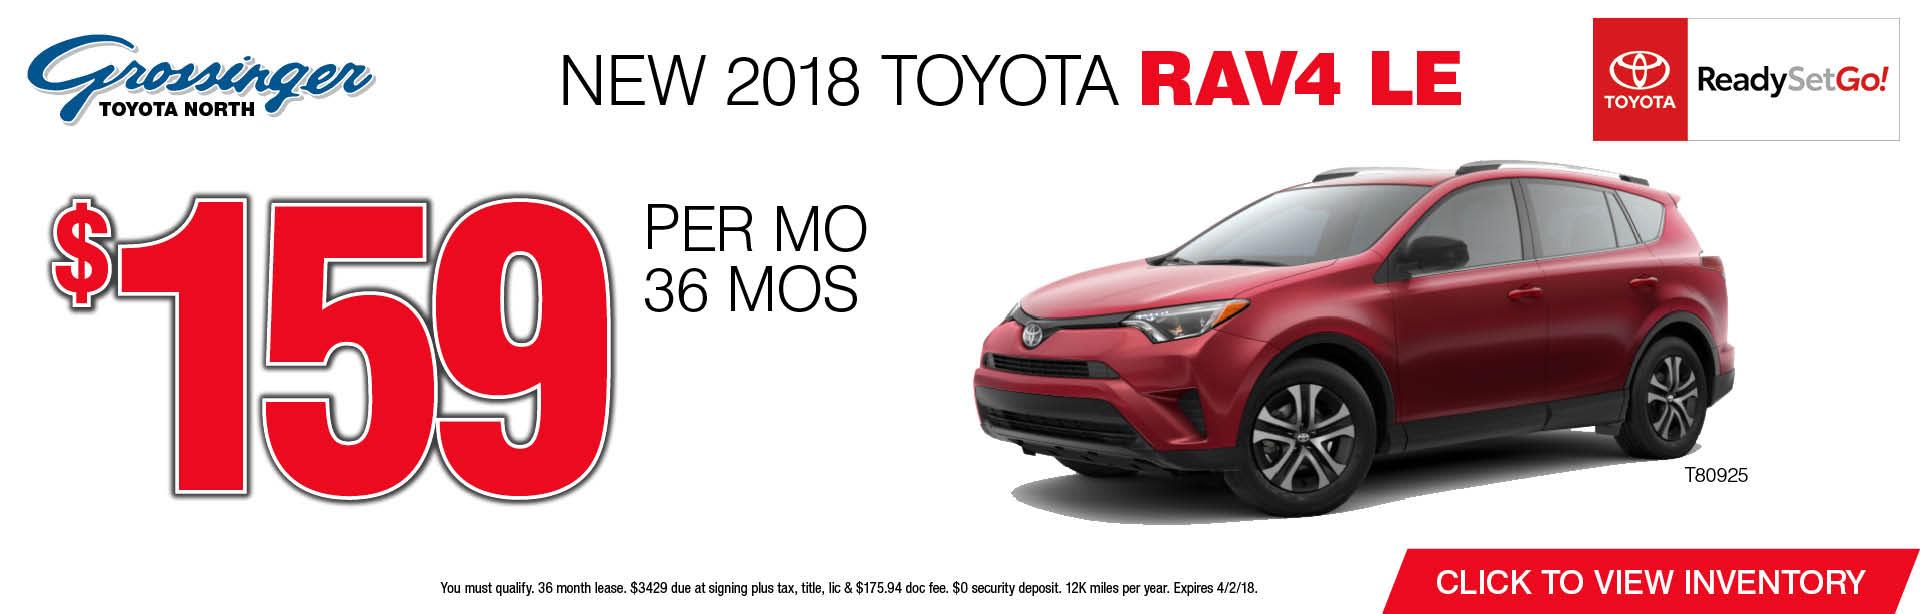 2018 Toyota RAV4 Special | Lincolnwood, IL Toyota Specials